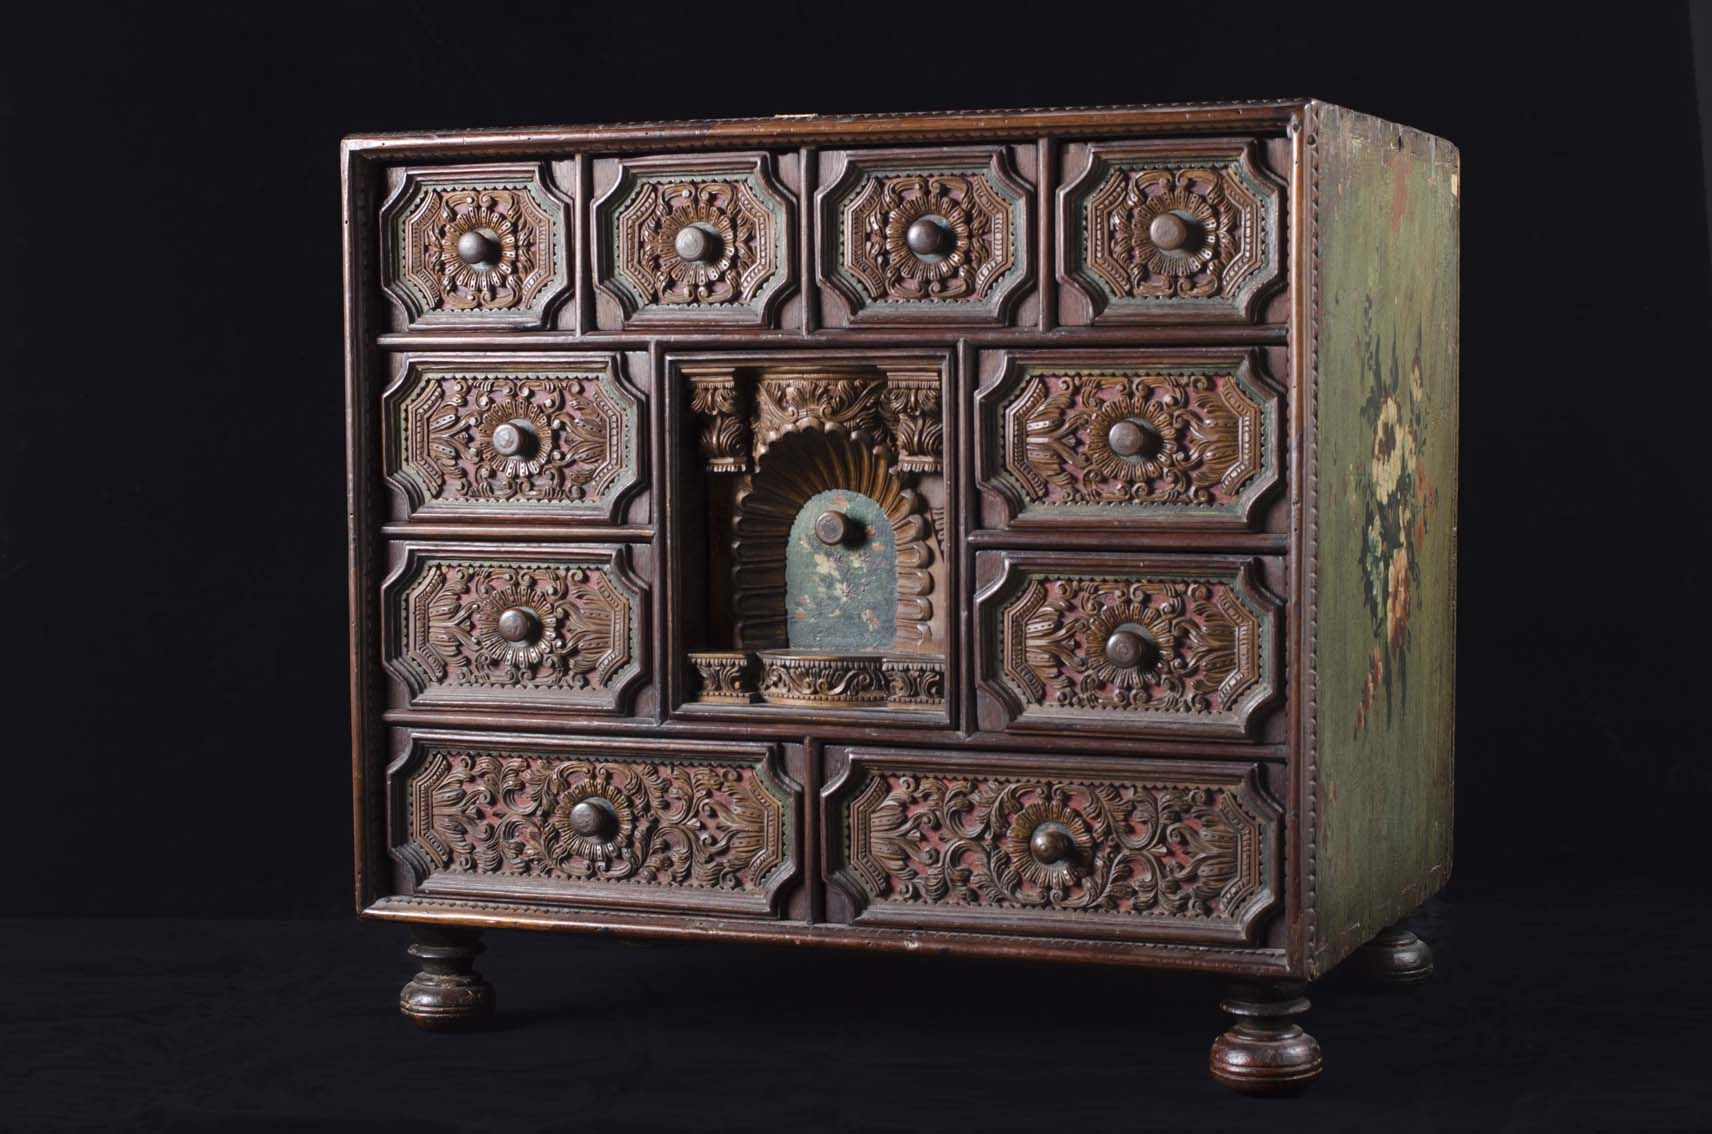 Bargue O Museomarc Muebles Furniture Pinterest El Interes  # Muebles Ebano Vargas